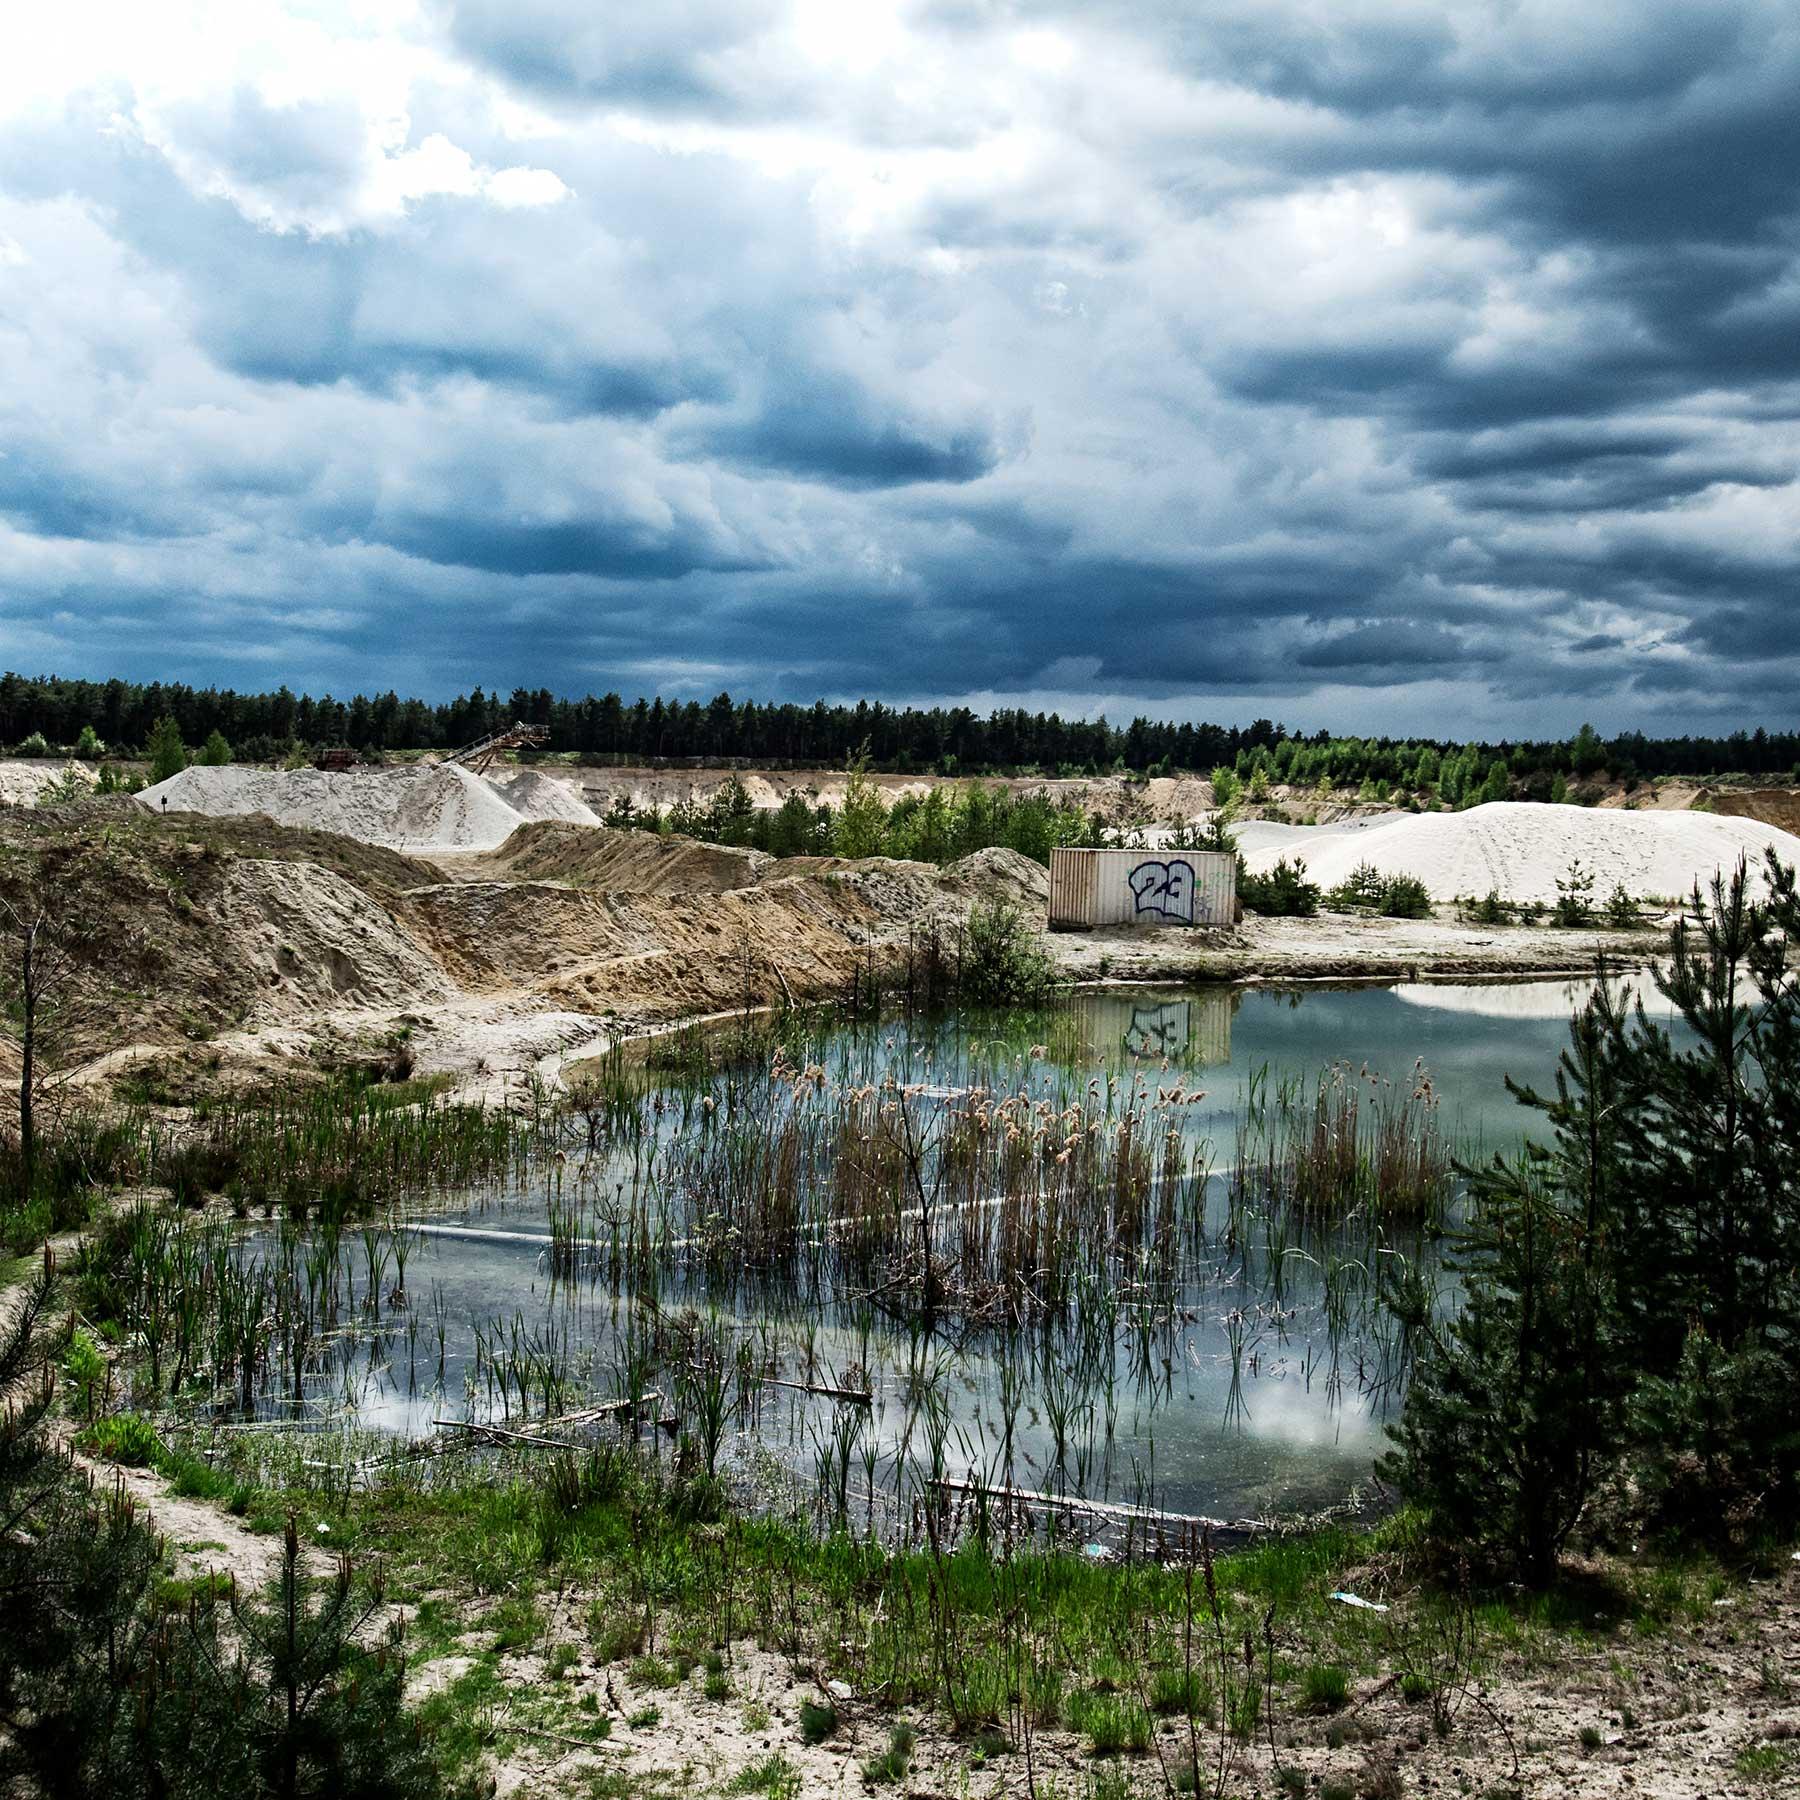 Abandoned mining quarry.